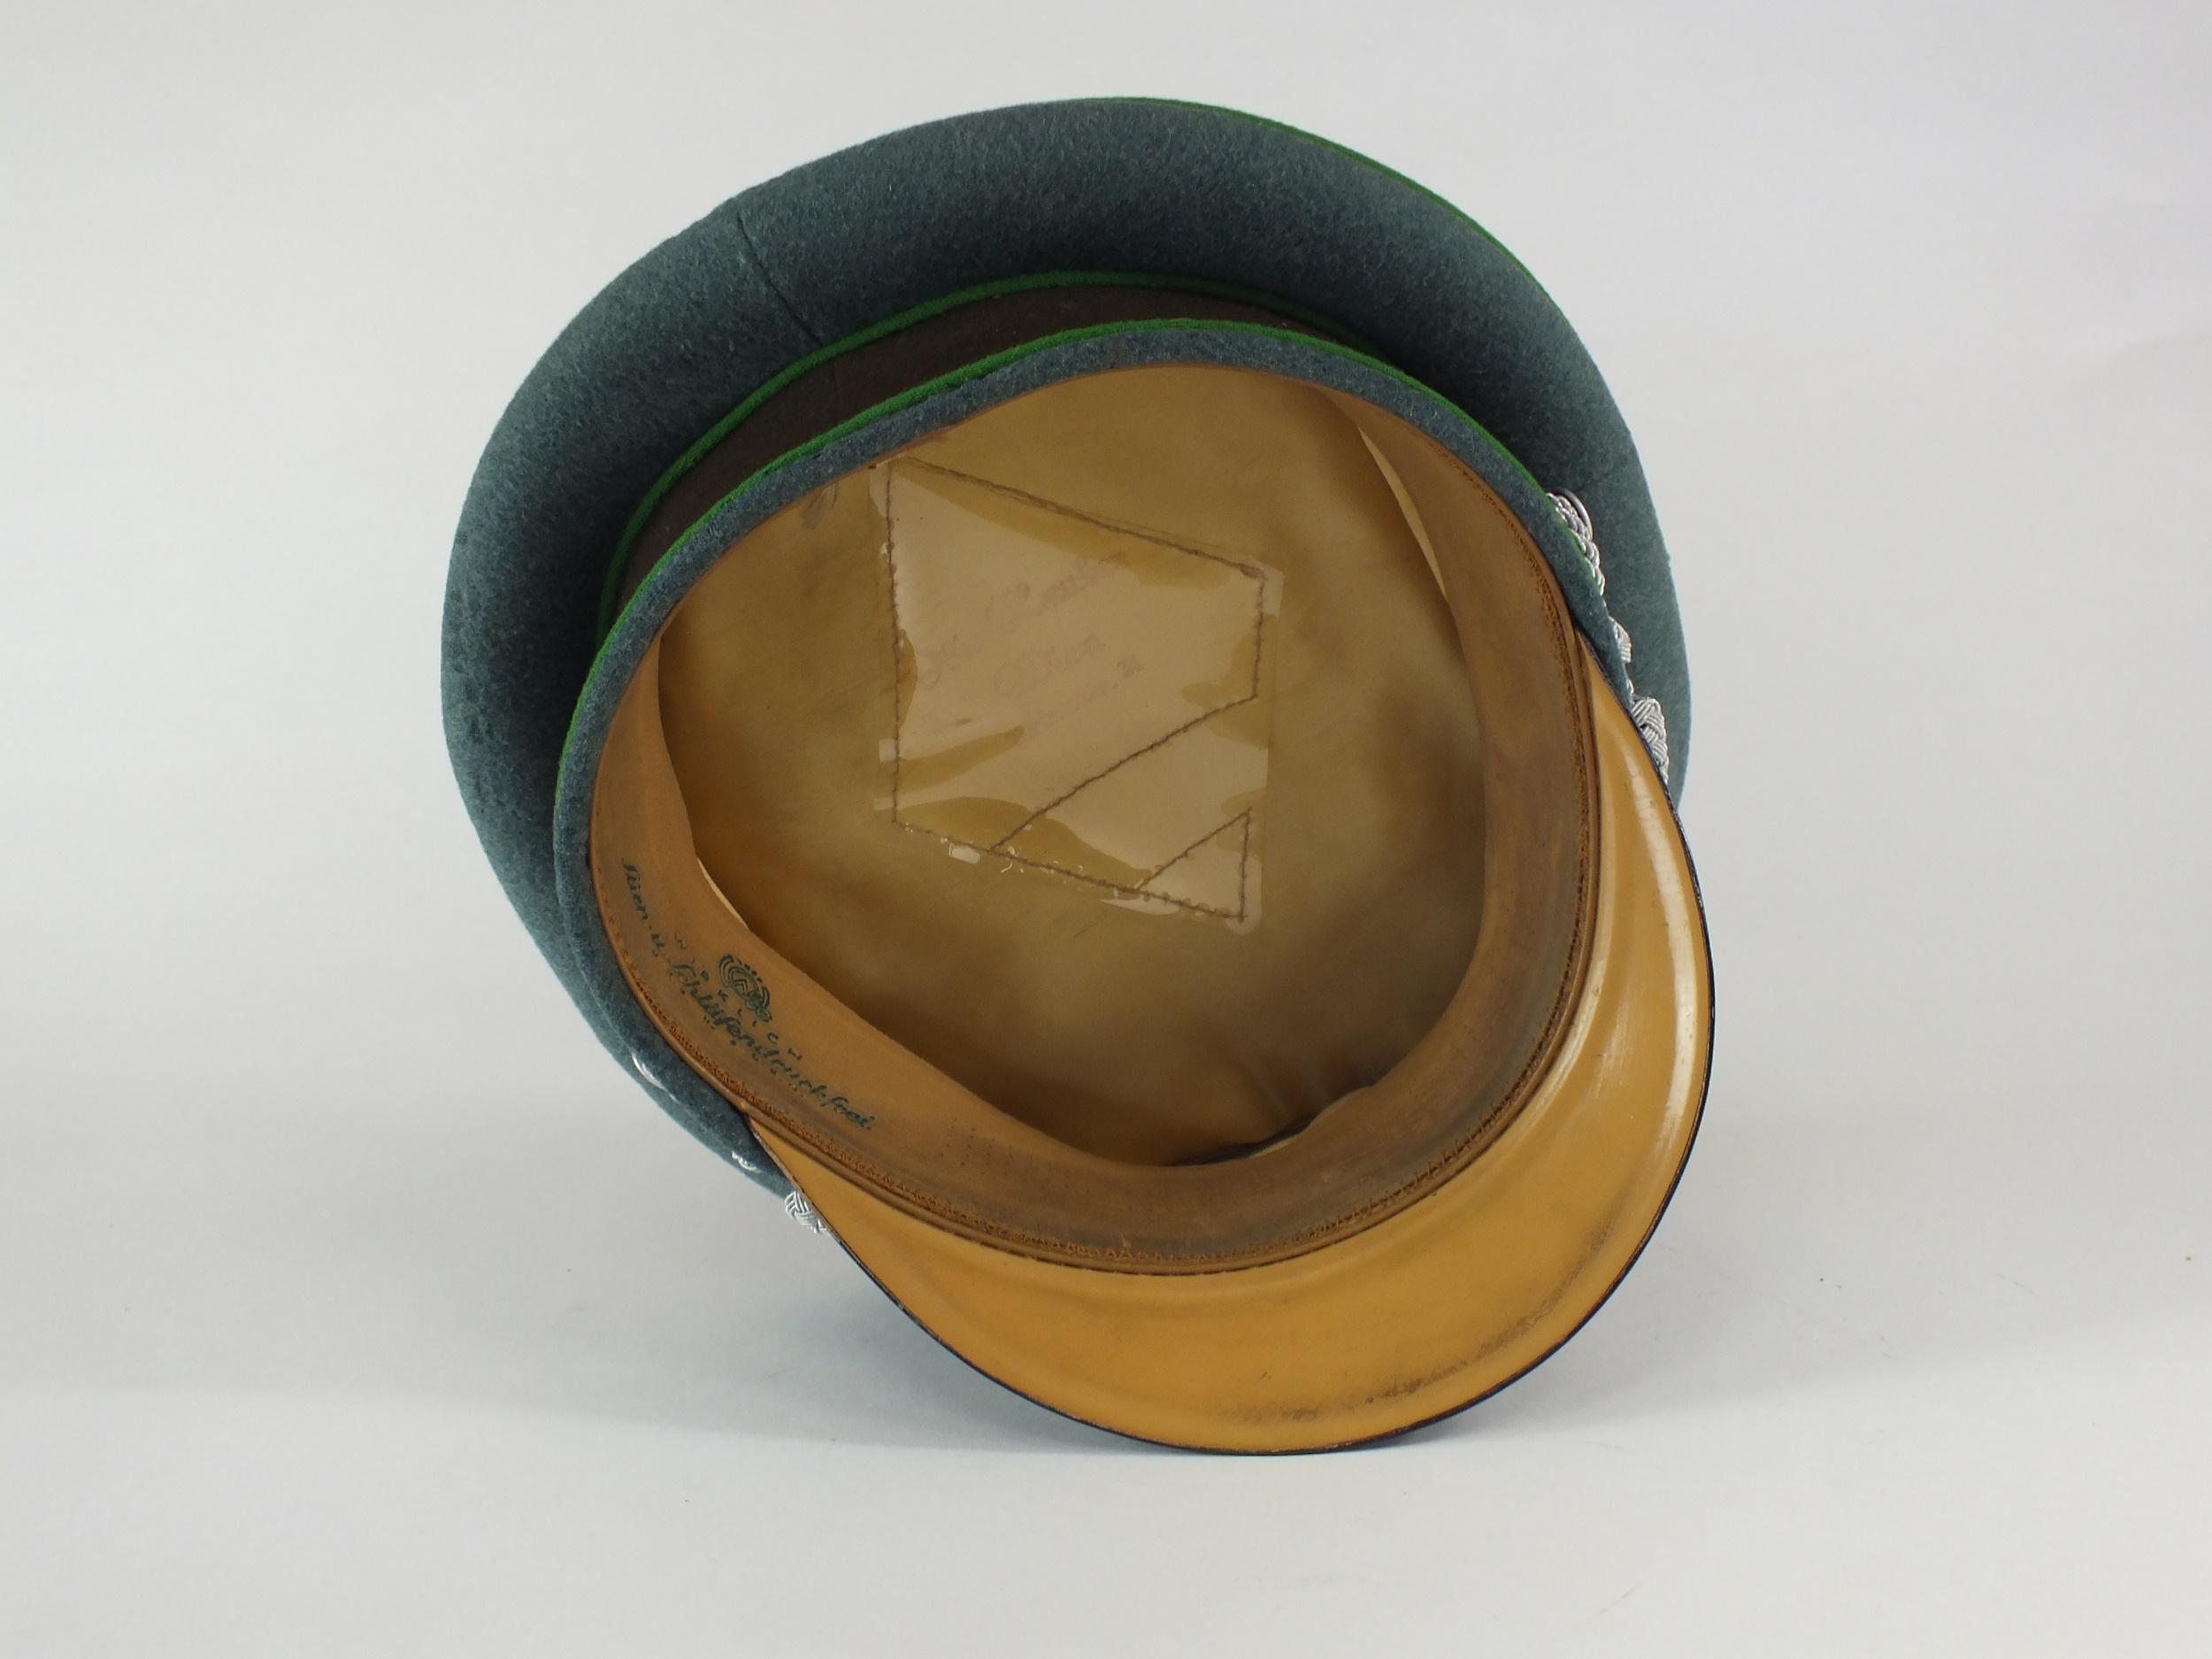 A German Third Reich Schutzpolizei (Protection Police) Officer's visor cap - Image 7 of 7